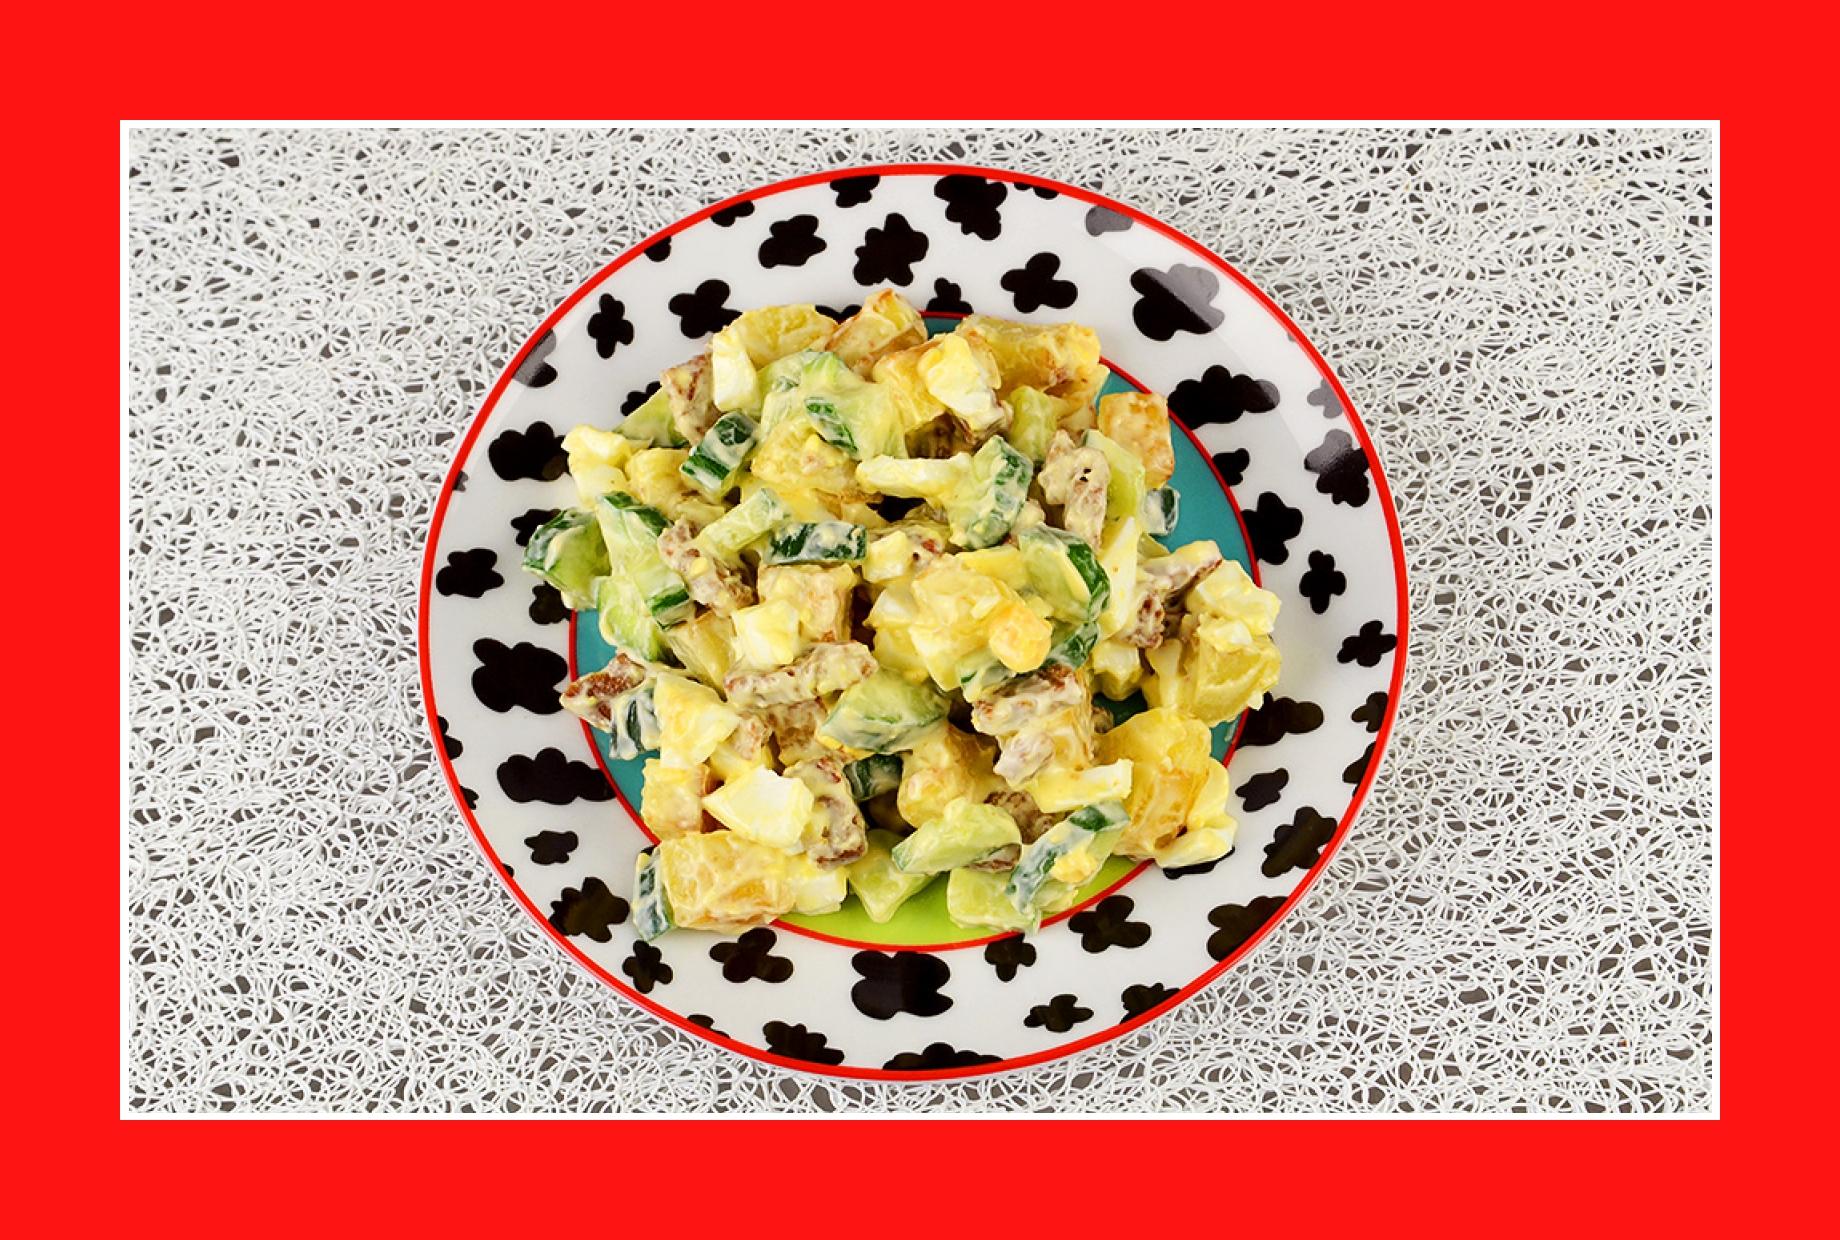 Eiersalat mit Bratkartoffeln Gurken Croutons